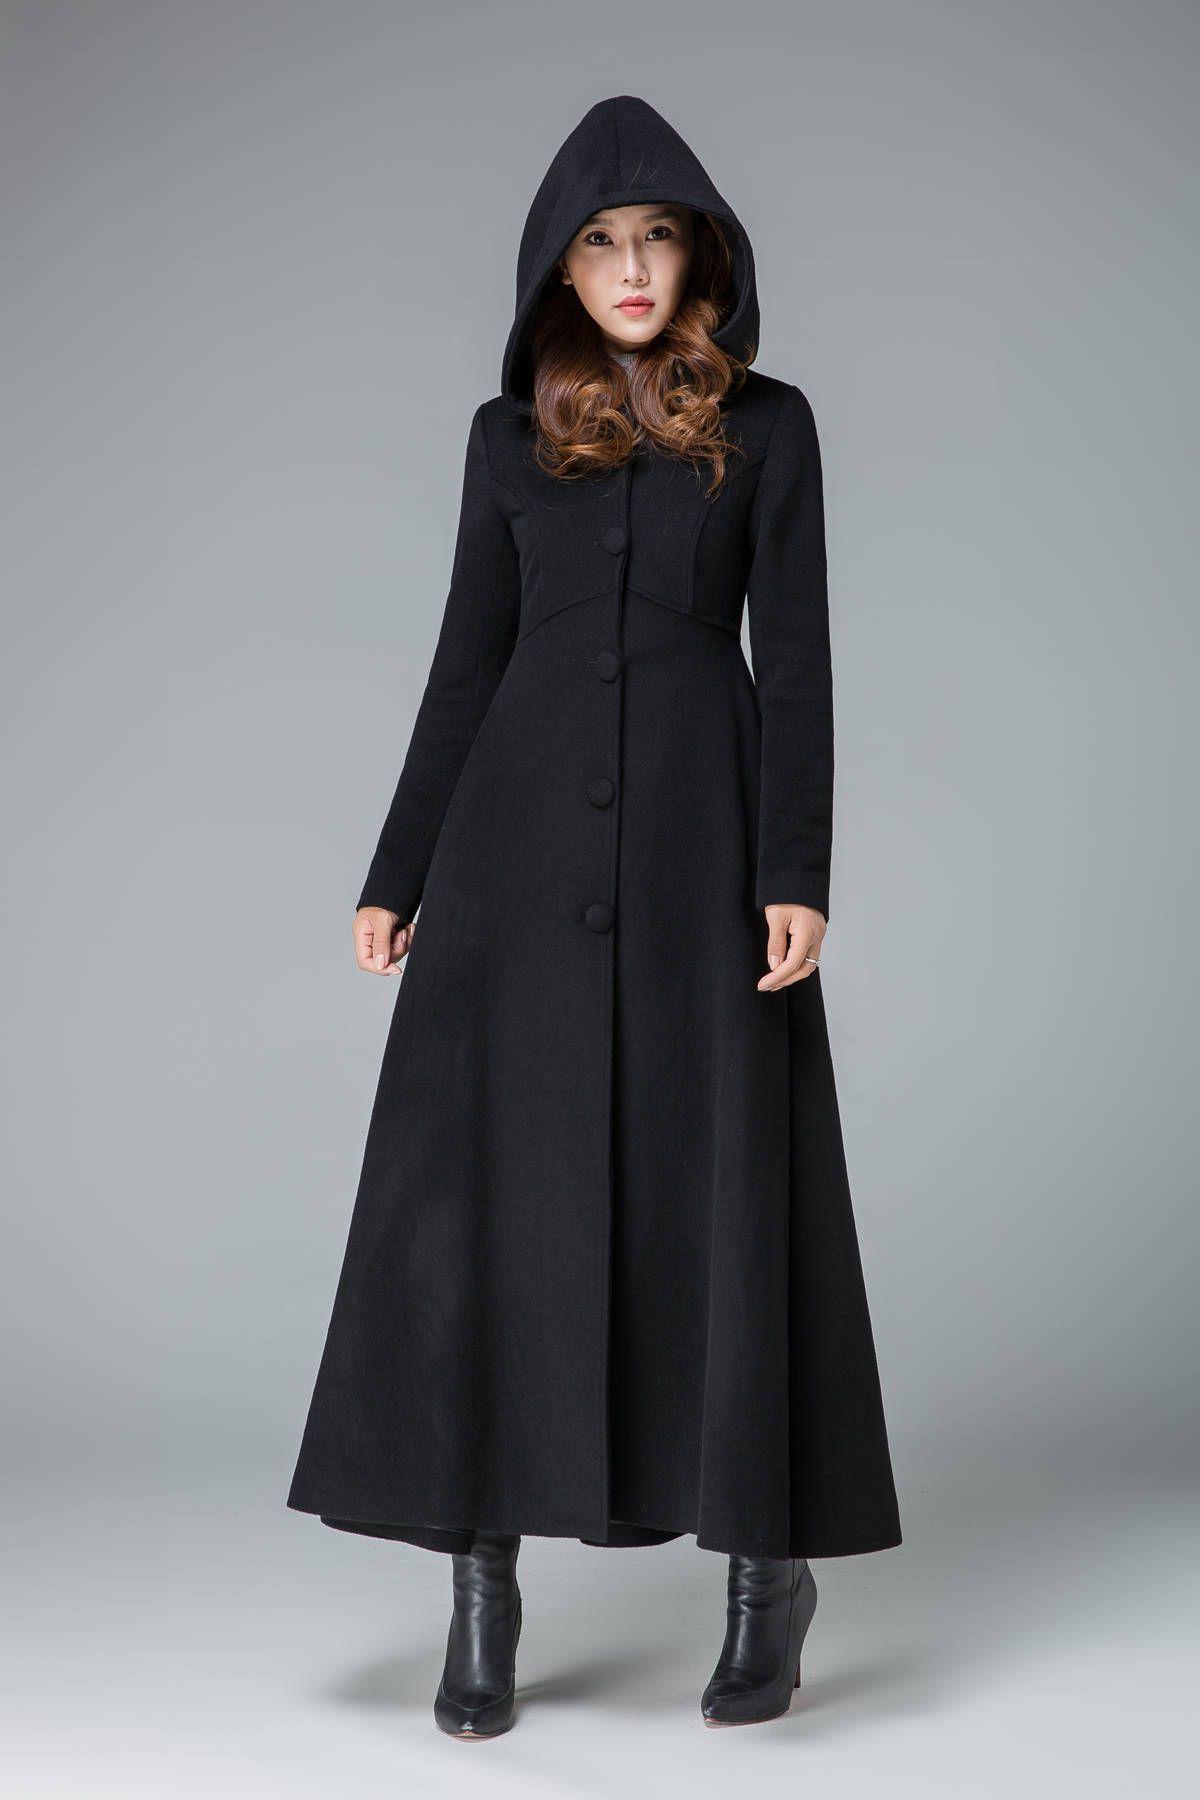 Black Wool Hooded Coat Womens, Women S Black Hooded Wool Winter Coat